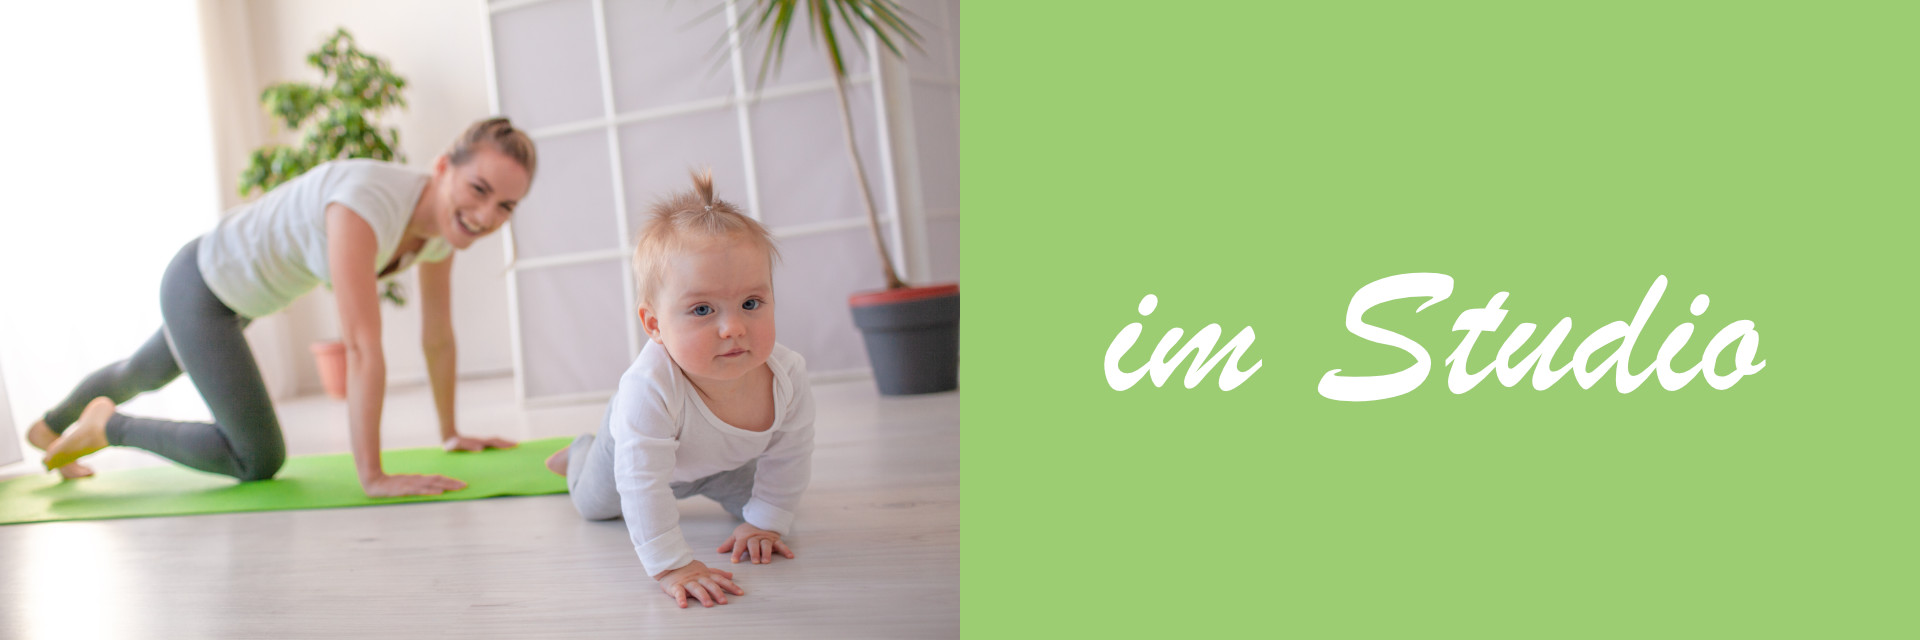 Rückbildungskurs Geburtsvorbereitung mit Yogaelementen